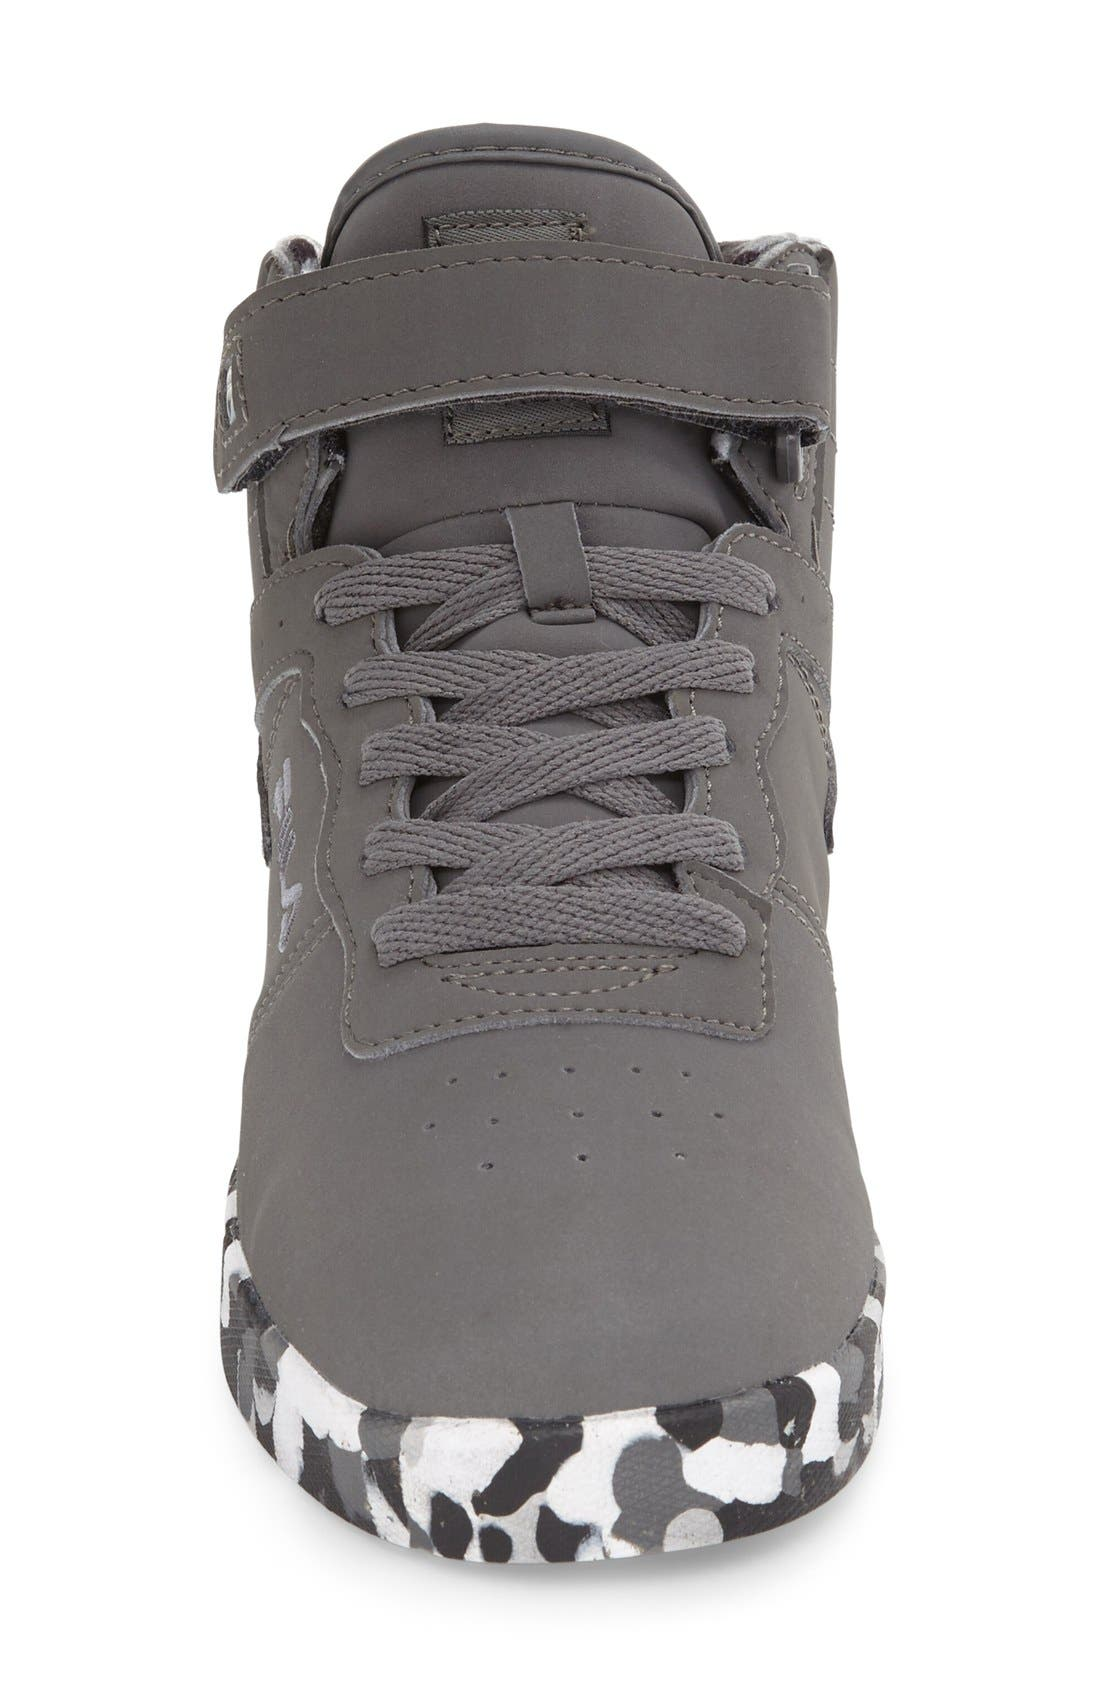 Vulc 13 Mashup High Top Sneaker,                             Alternate thumbnail 9, color,